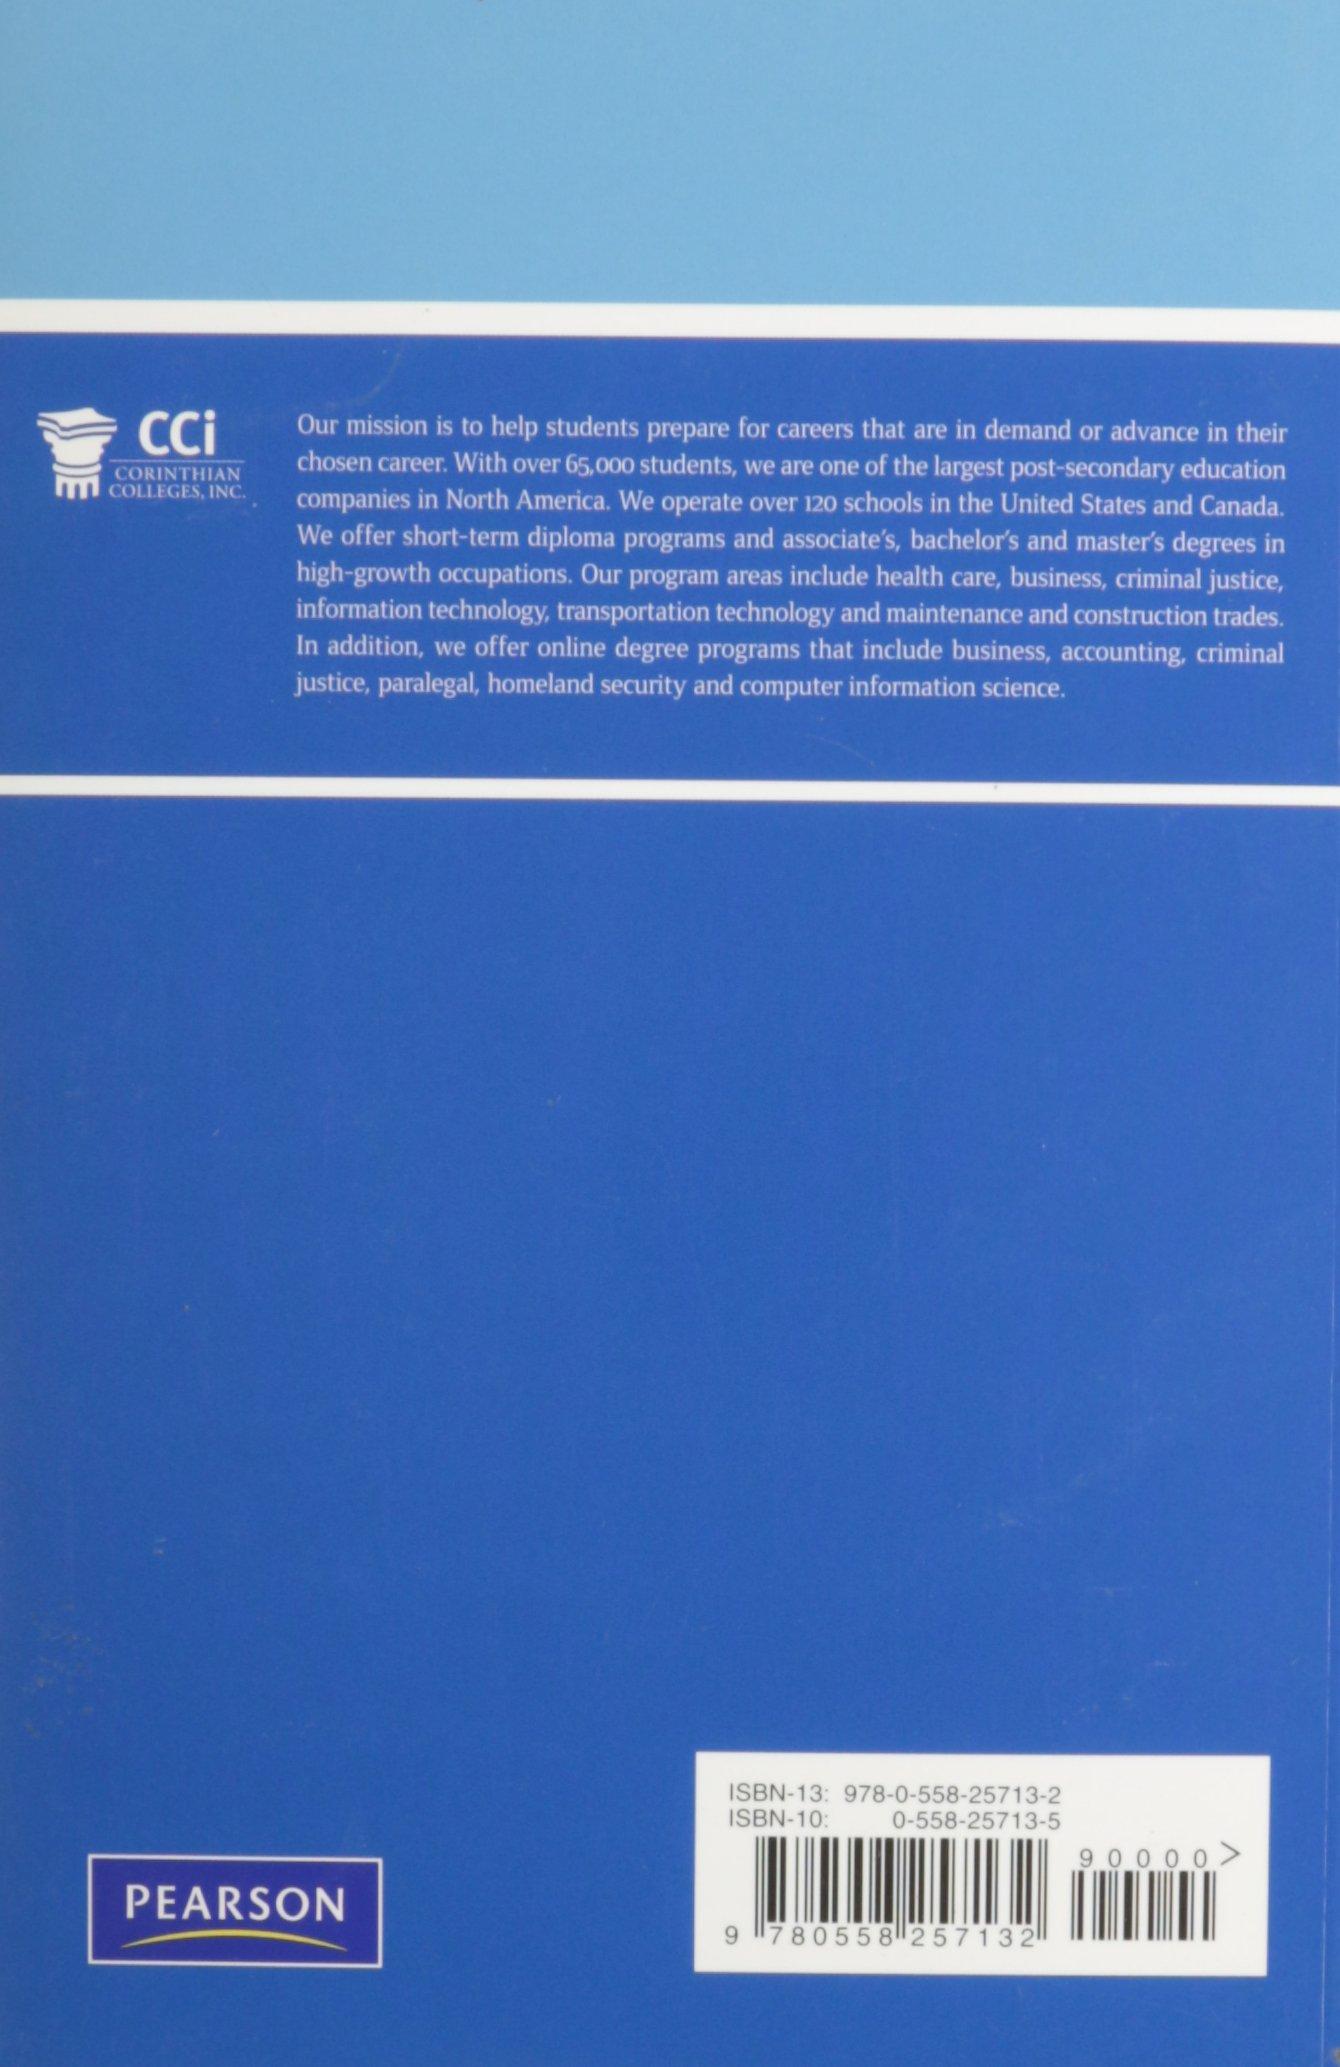 Writing Research Papers a Complete Guide: James D Lester Jr. James D  Lester: 9780558257132: Amazon.com: Books